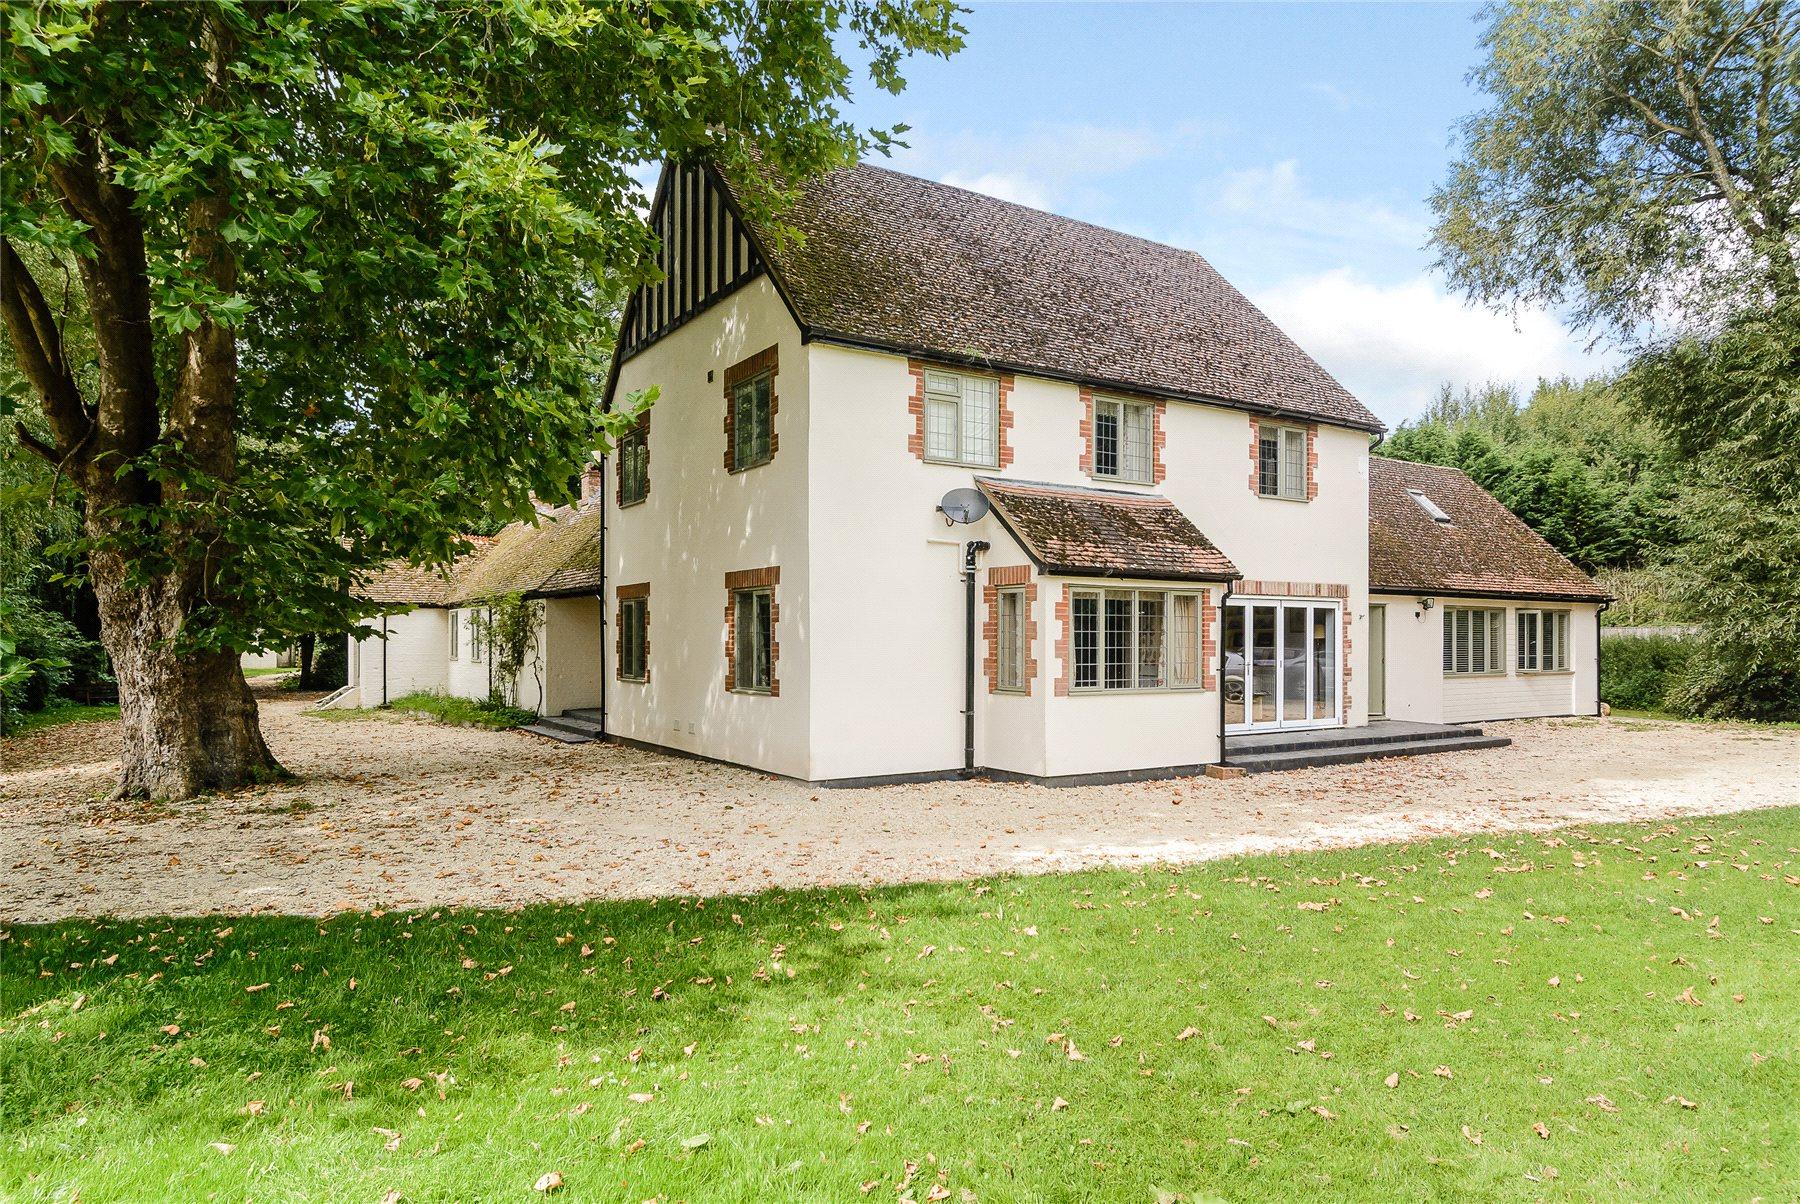 Standlake, Witney, Oxfordshire, OX29